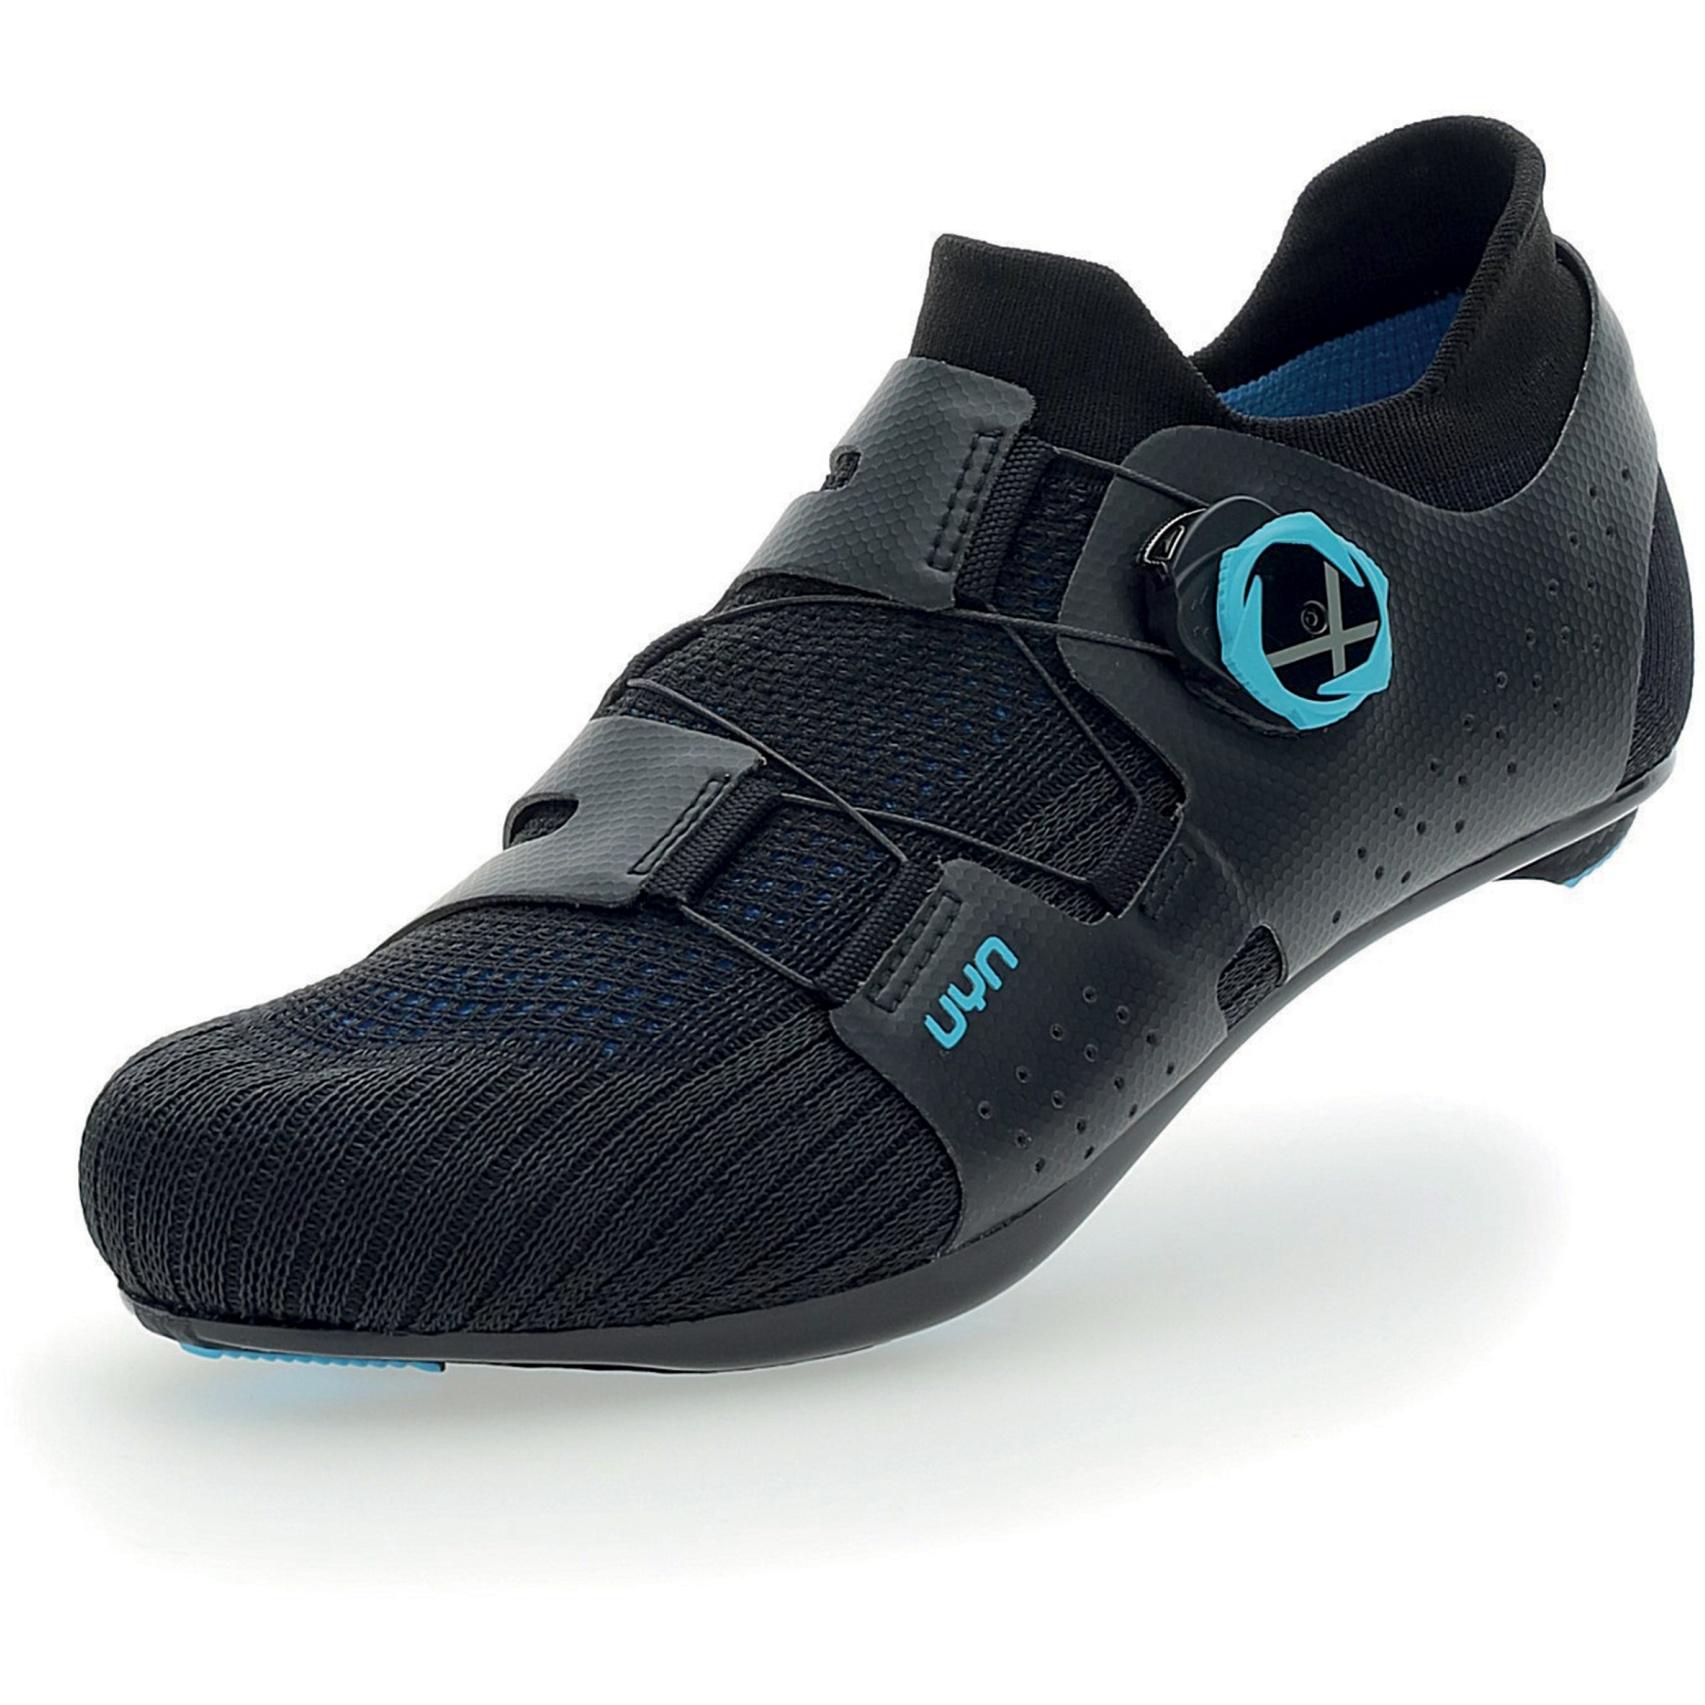 UYN Naked Carbon Rennradschuhe - Schwarz/Blau